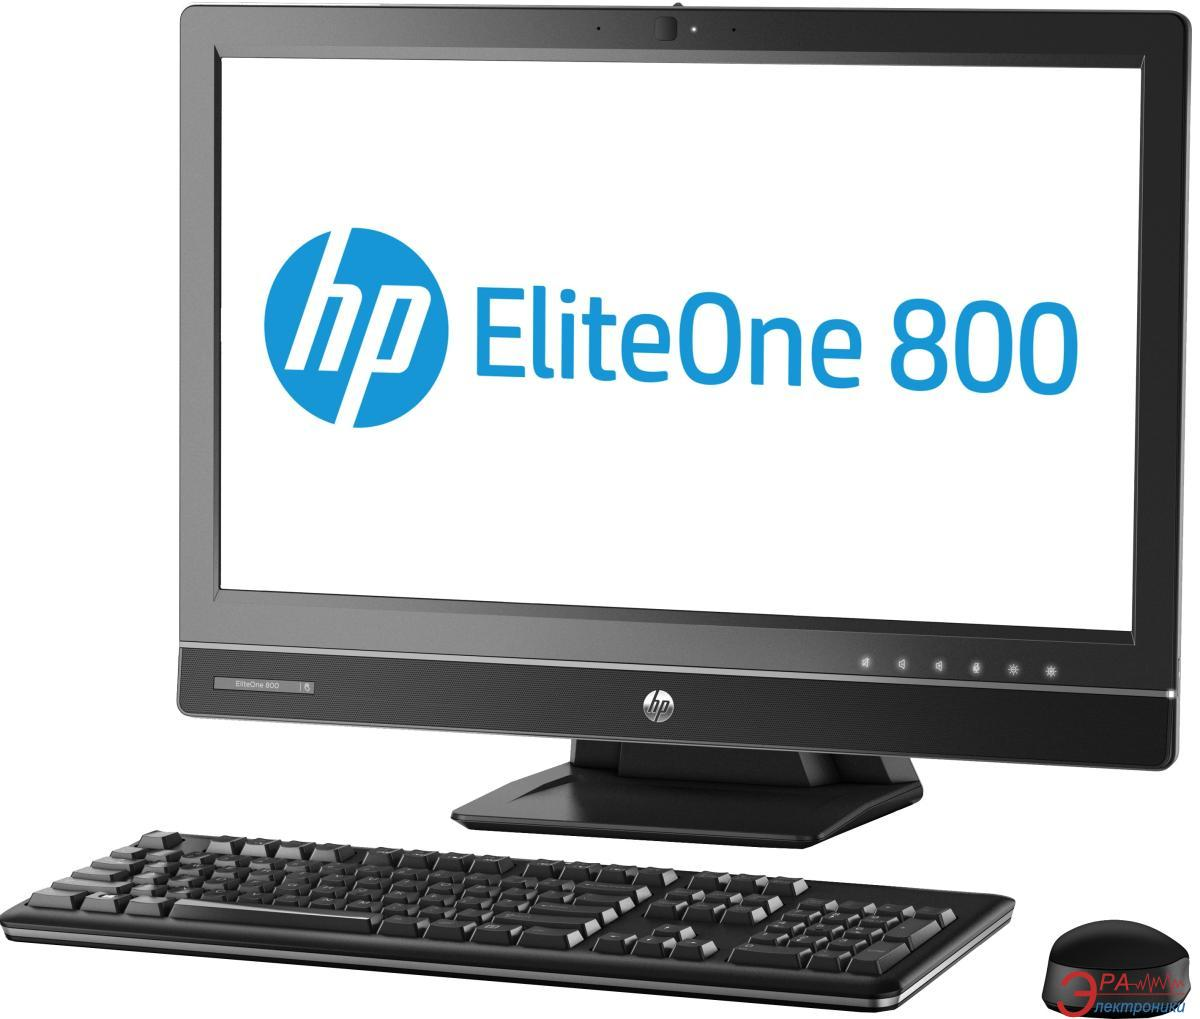 Моноблок HP EliteOne 800 G1 (H5T92EA)